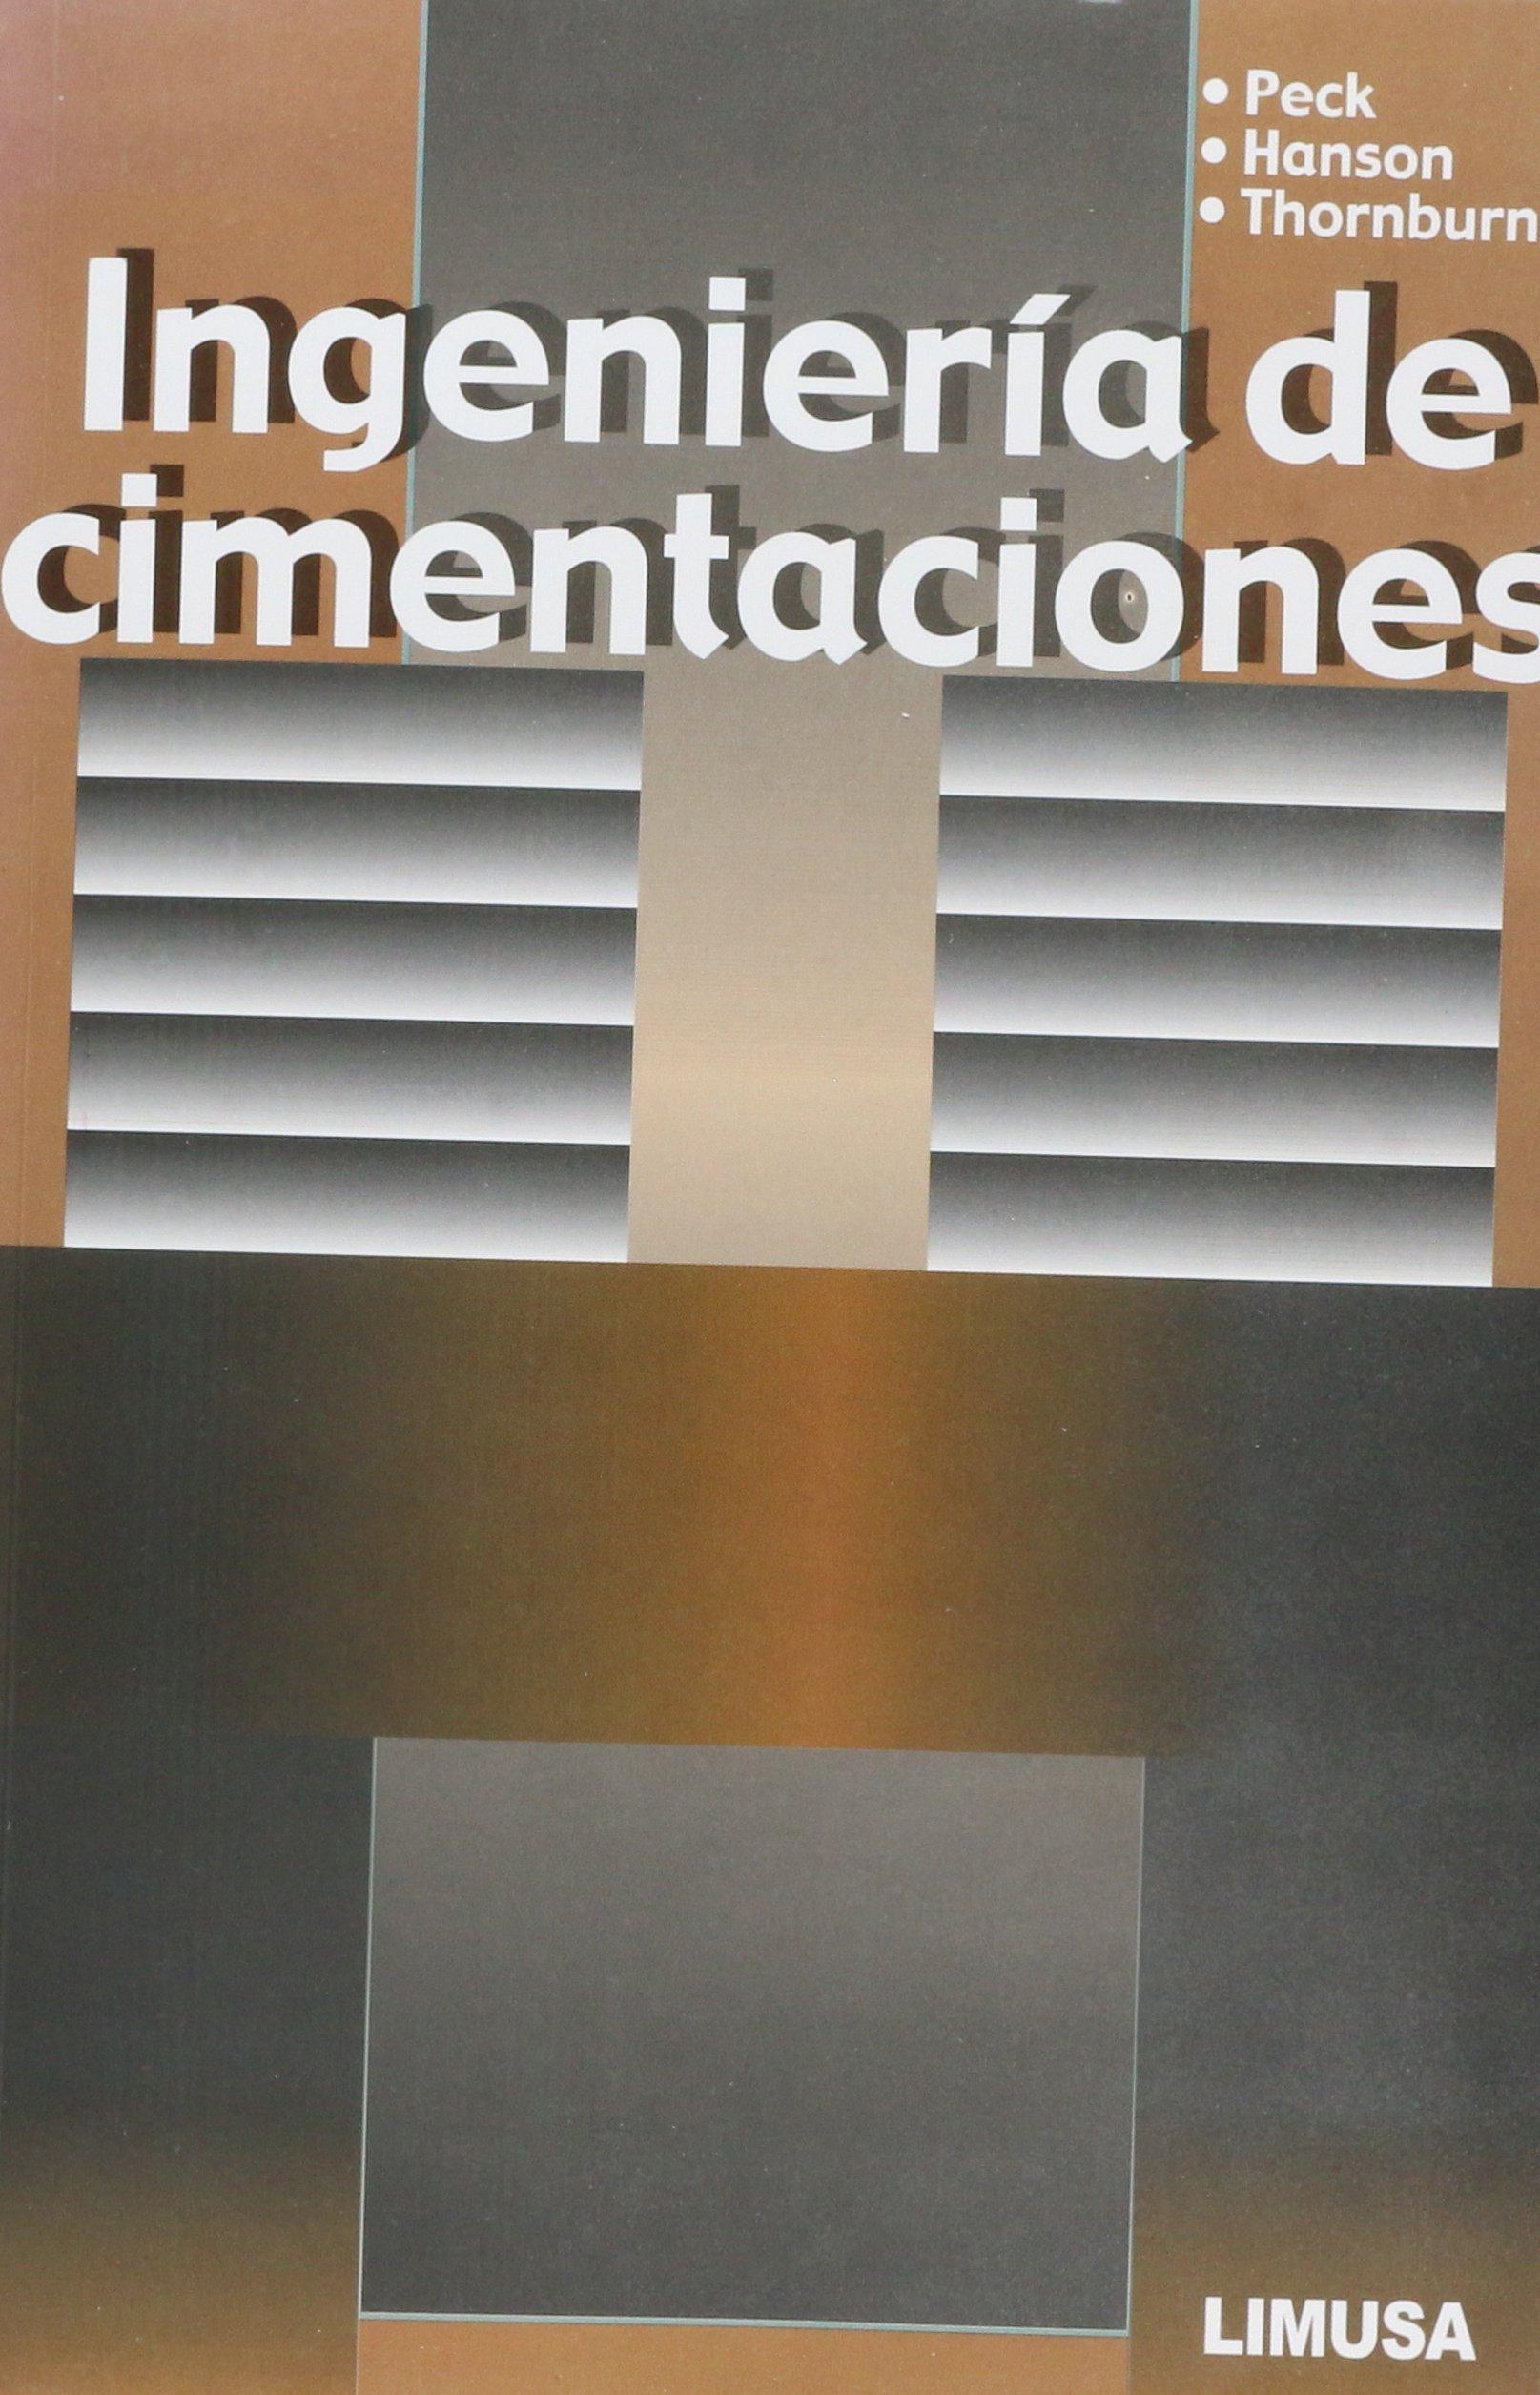 Ingenieria de cimentaciones / Foundation Engineering (Spanish Edition)